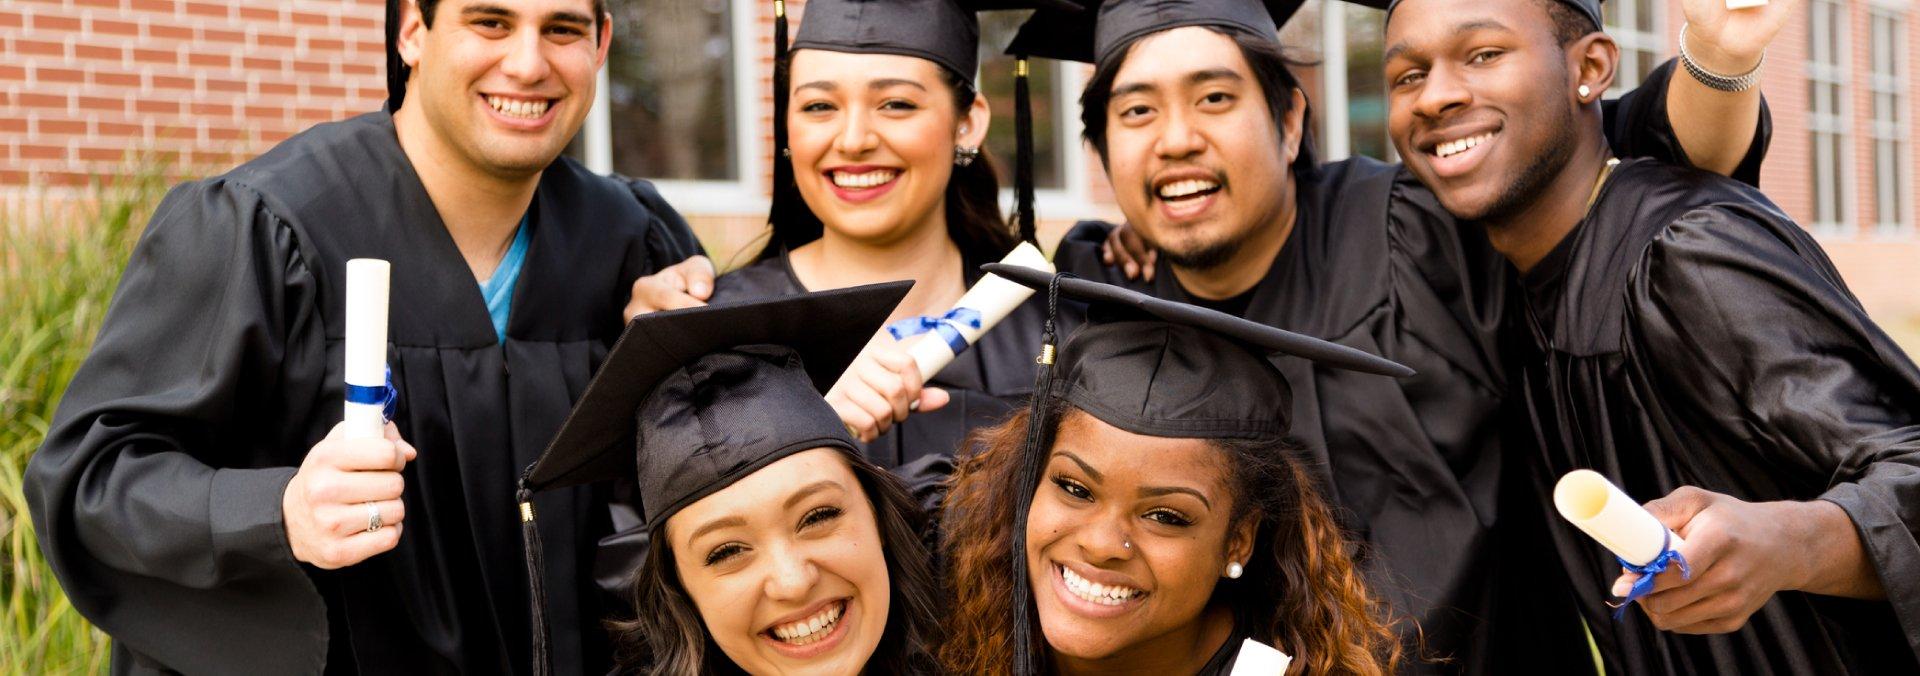 Graduates Preparing for Their Careers